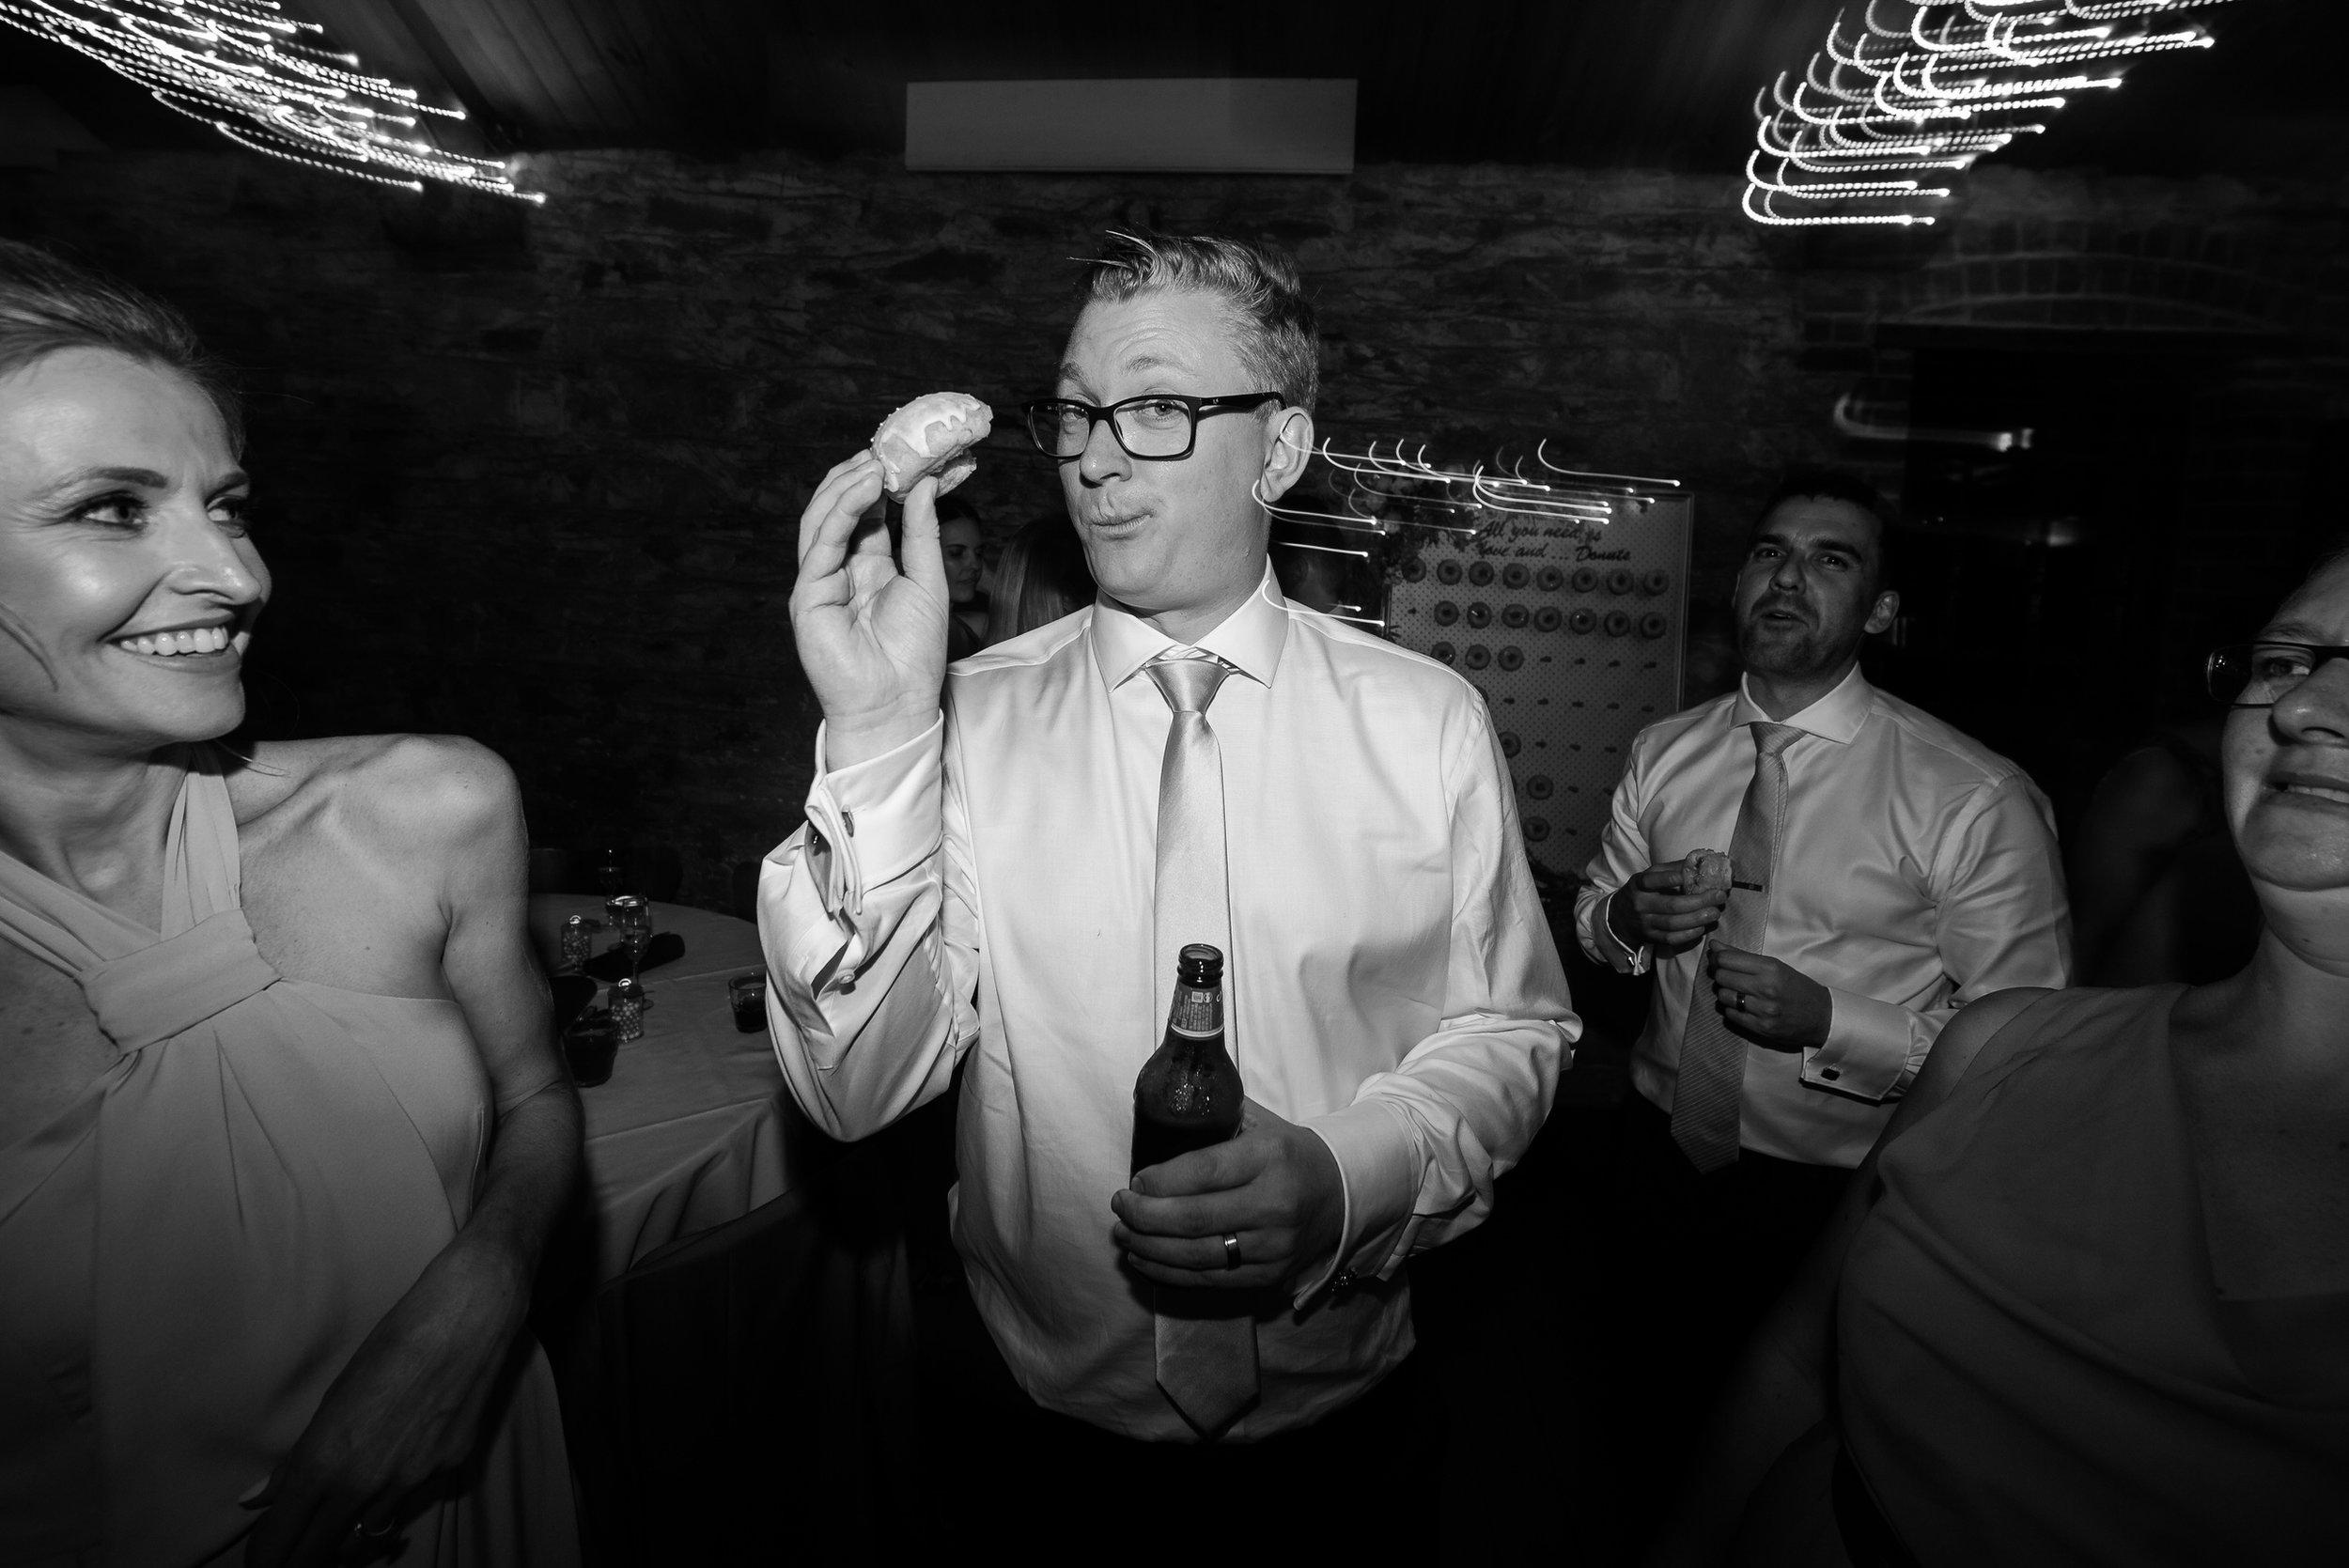 Justin_And_Jim_Photography_Chateau_Dore_Bendigo_Wedding118.JPG